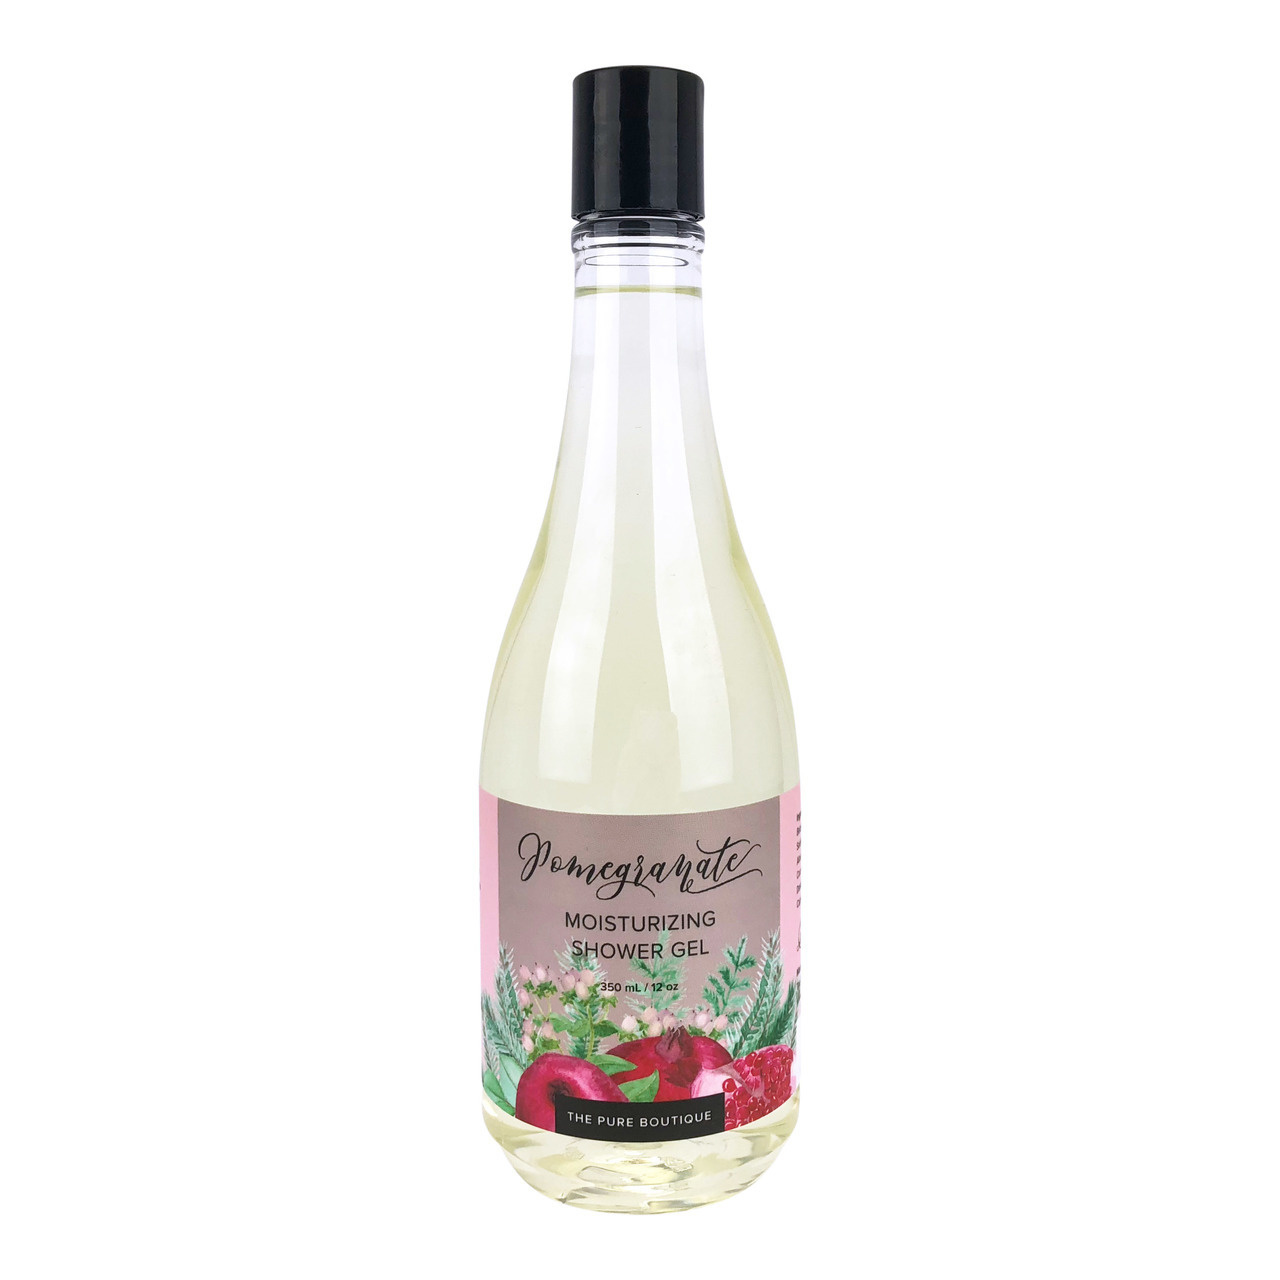 Moisturizing Shower Gel - Pomegranate-1